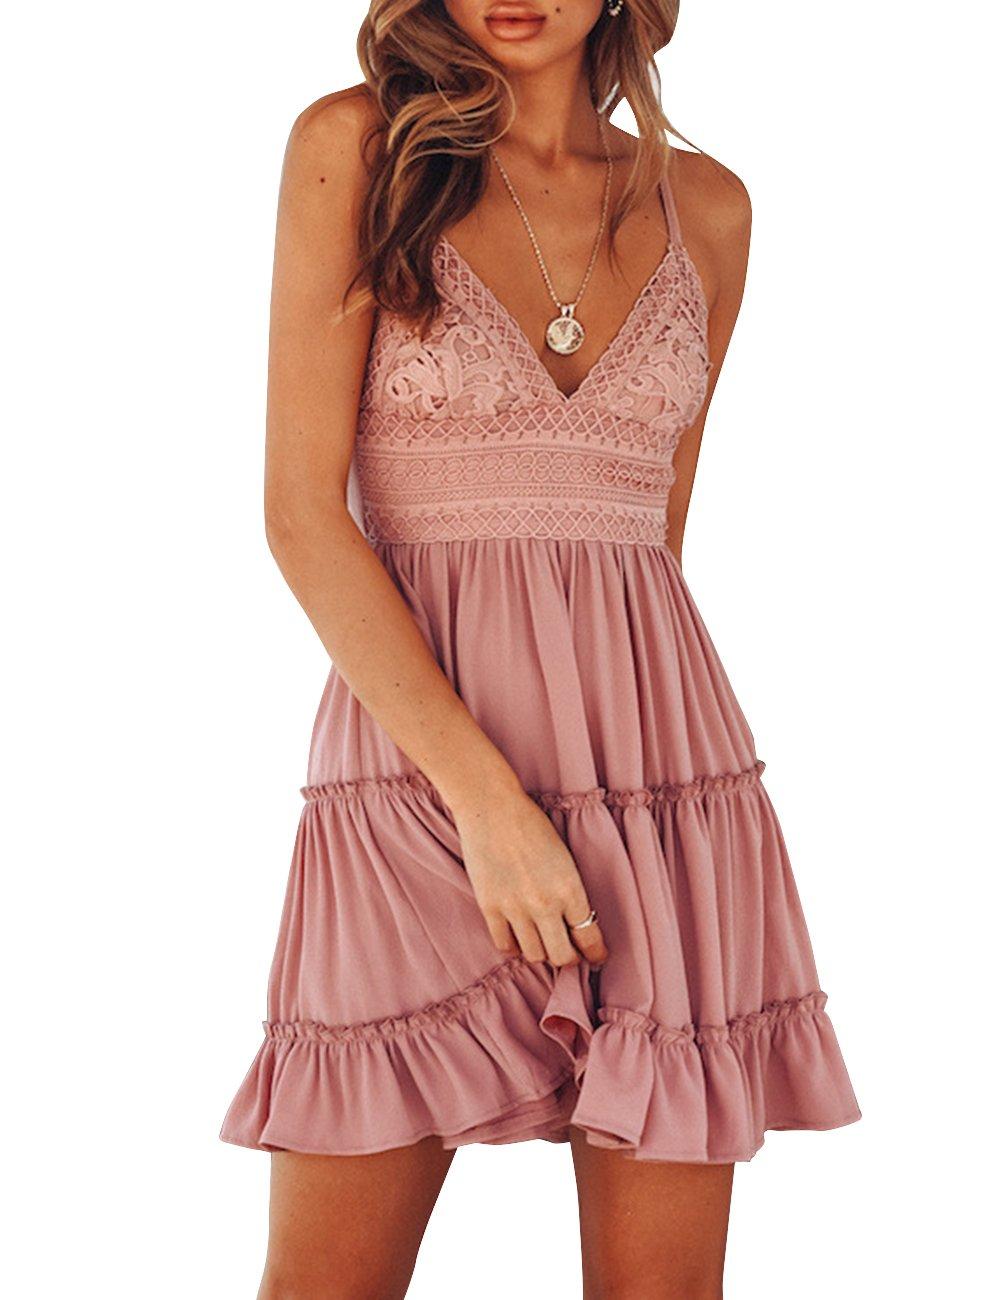 2afe8a32f35 Amazon.com  Sanifer Women s Sexy Backless A-line Mini Dress Summer Beach  Sundress Party Dress (L